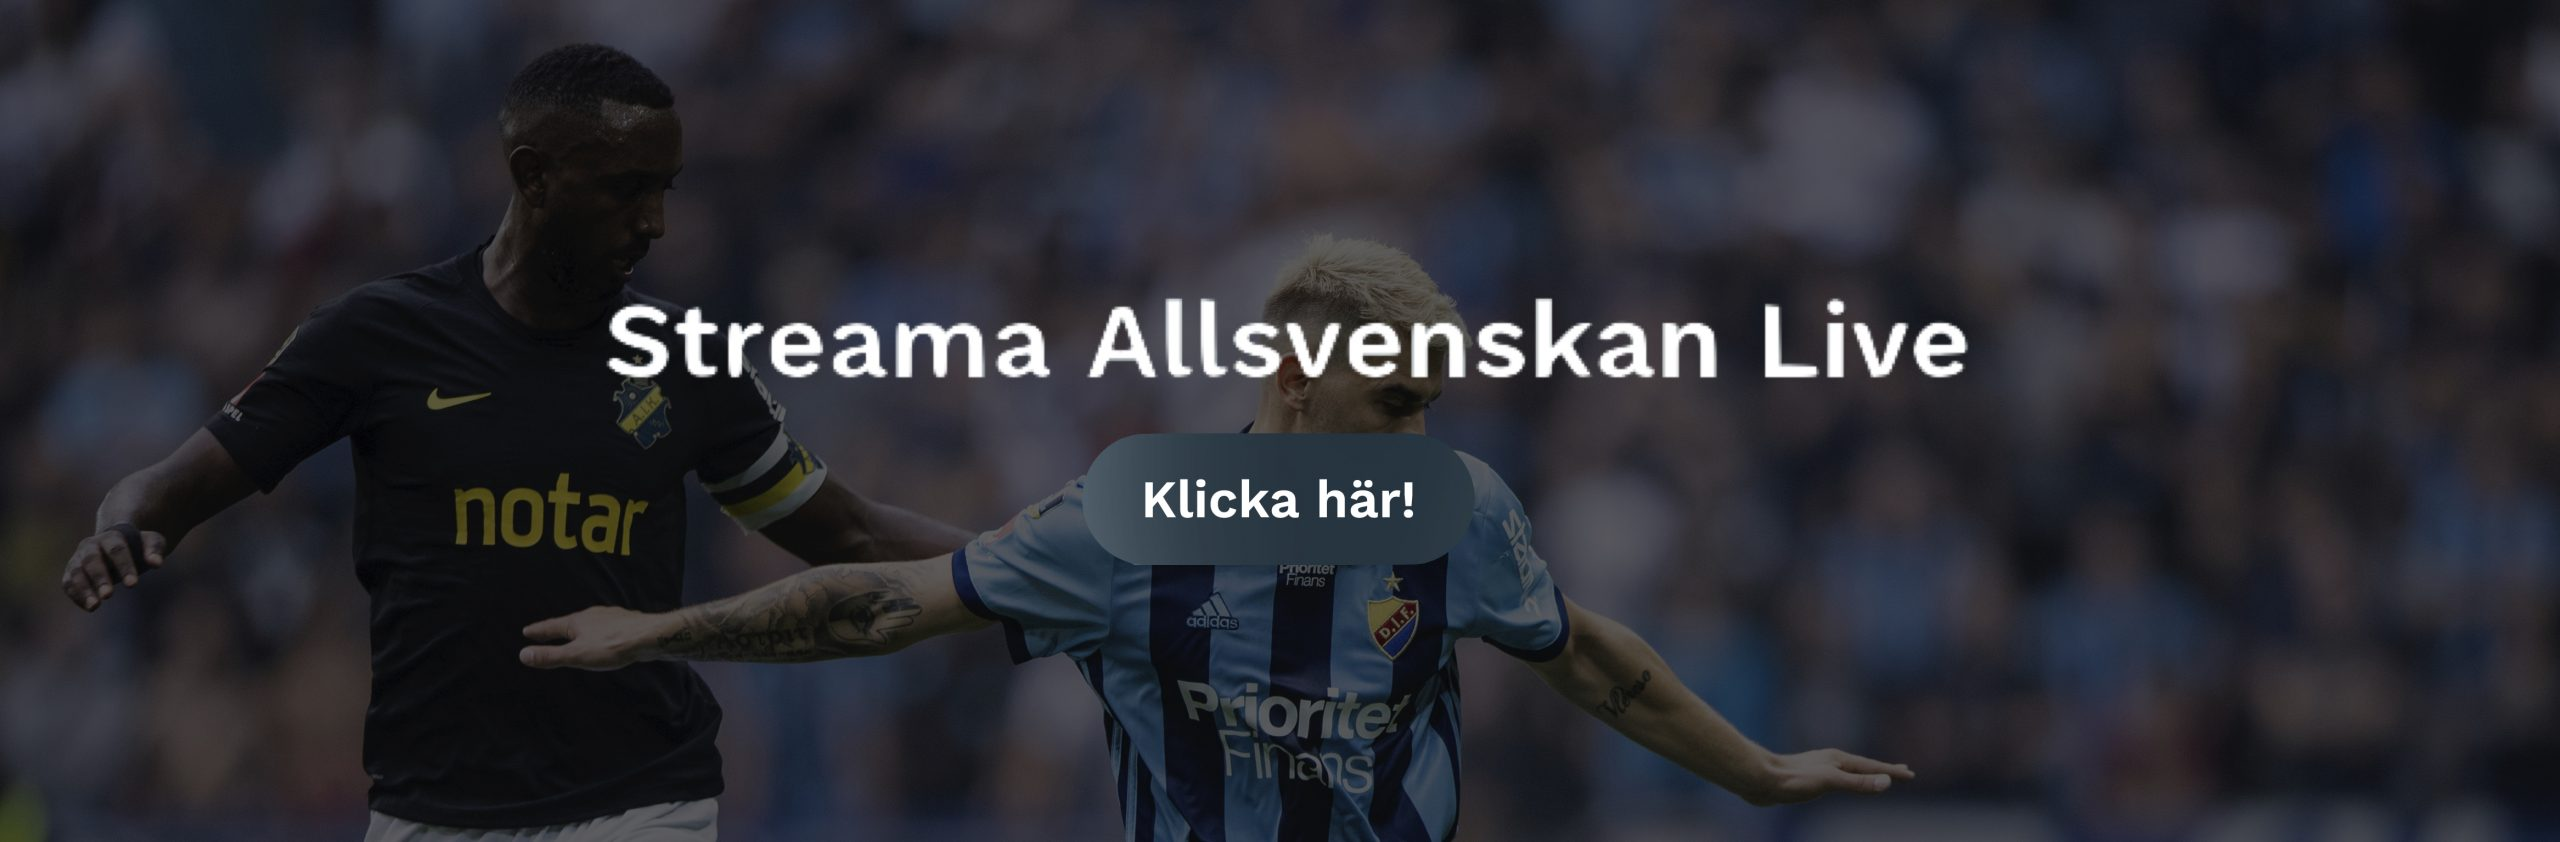 AIK Djurgården live stream gratis? Streama AIK vs Djurgården live stream free!